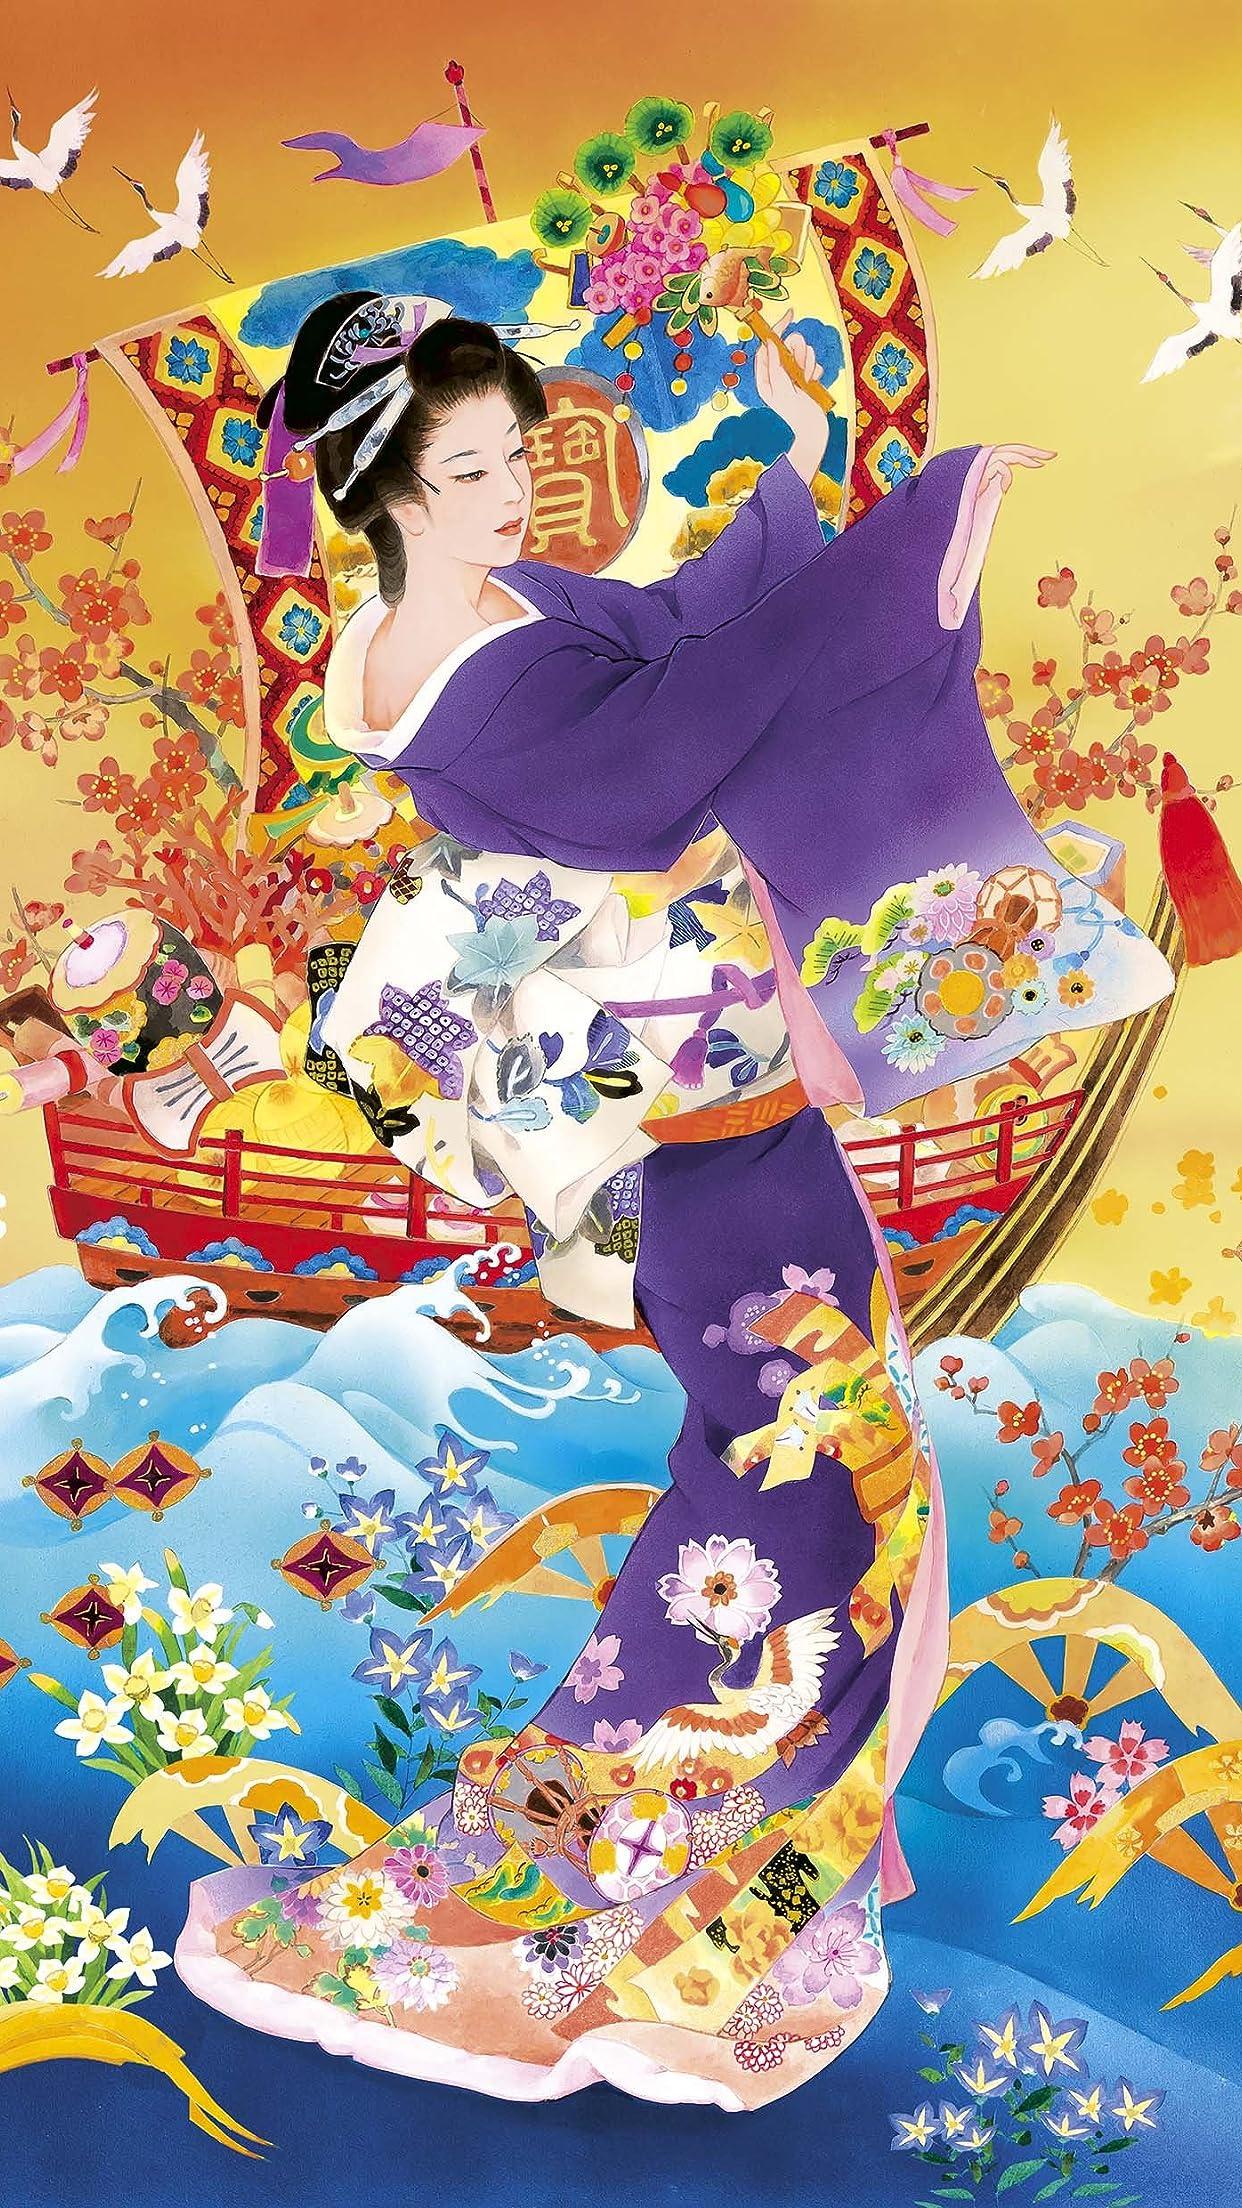 日本画 『招福の舞』 美人画 森田春代 iPhone8,7,6 Plus 壁紙(1242×2208)画像